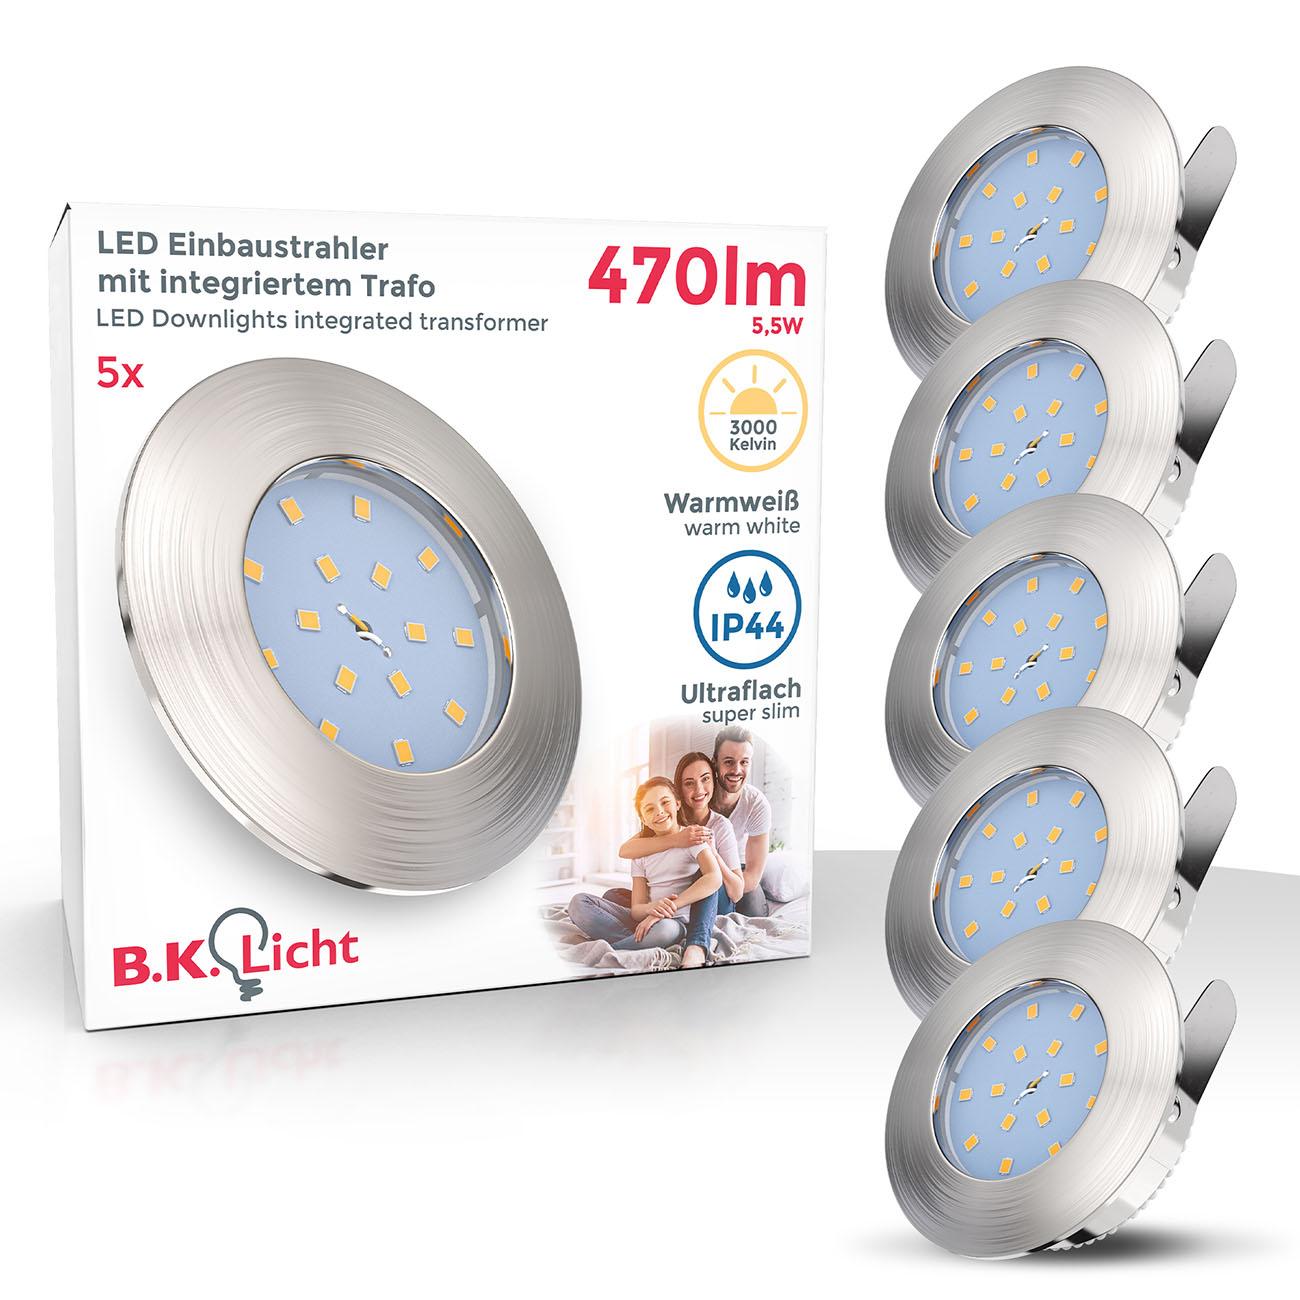 LED Einbaustrahler | Bad Einbauleuchte 5er SET | ultra flach 5W IP44 dimmbar